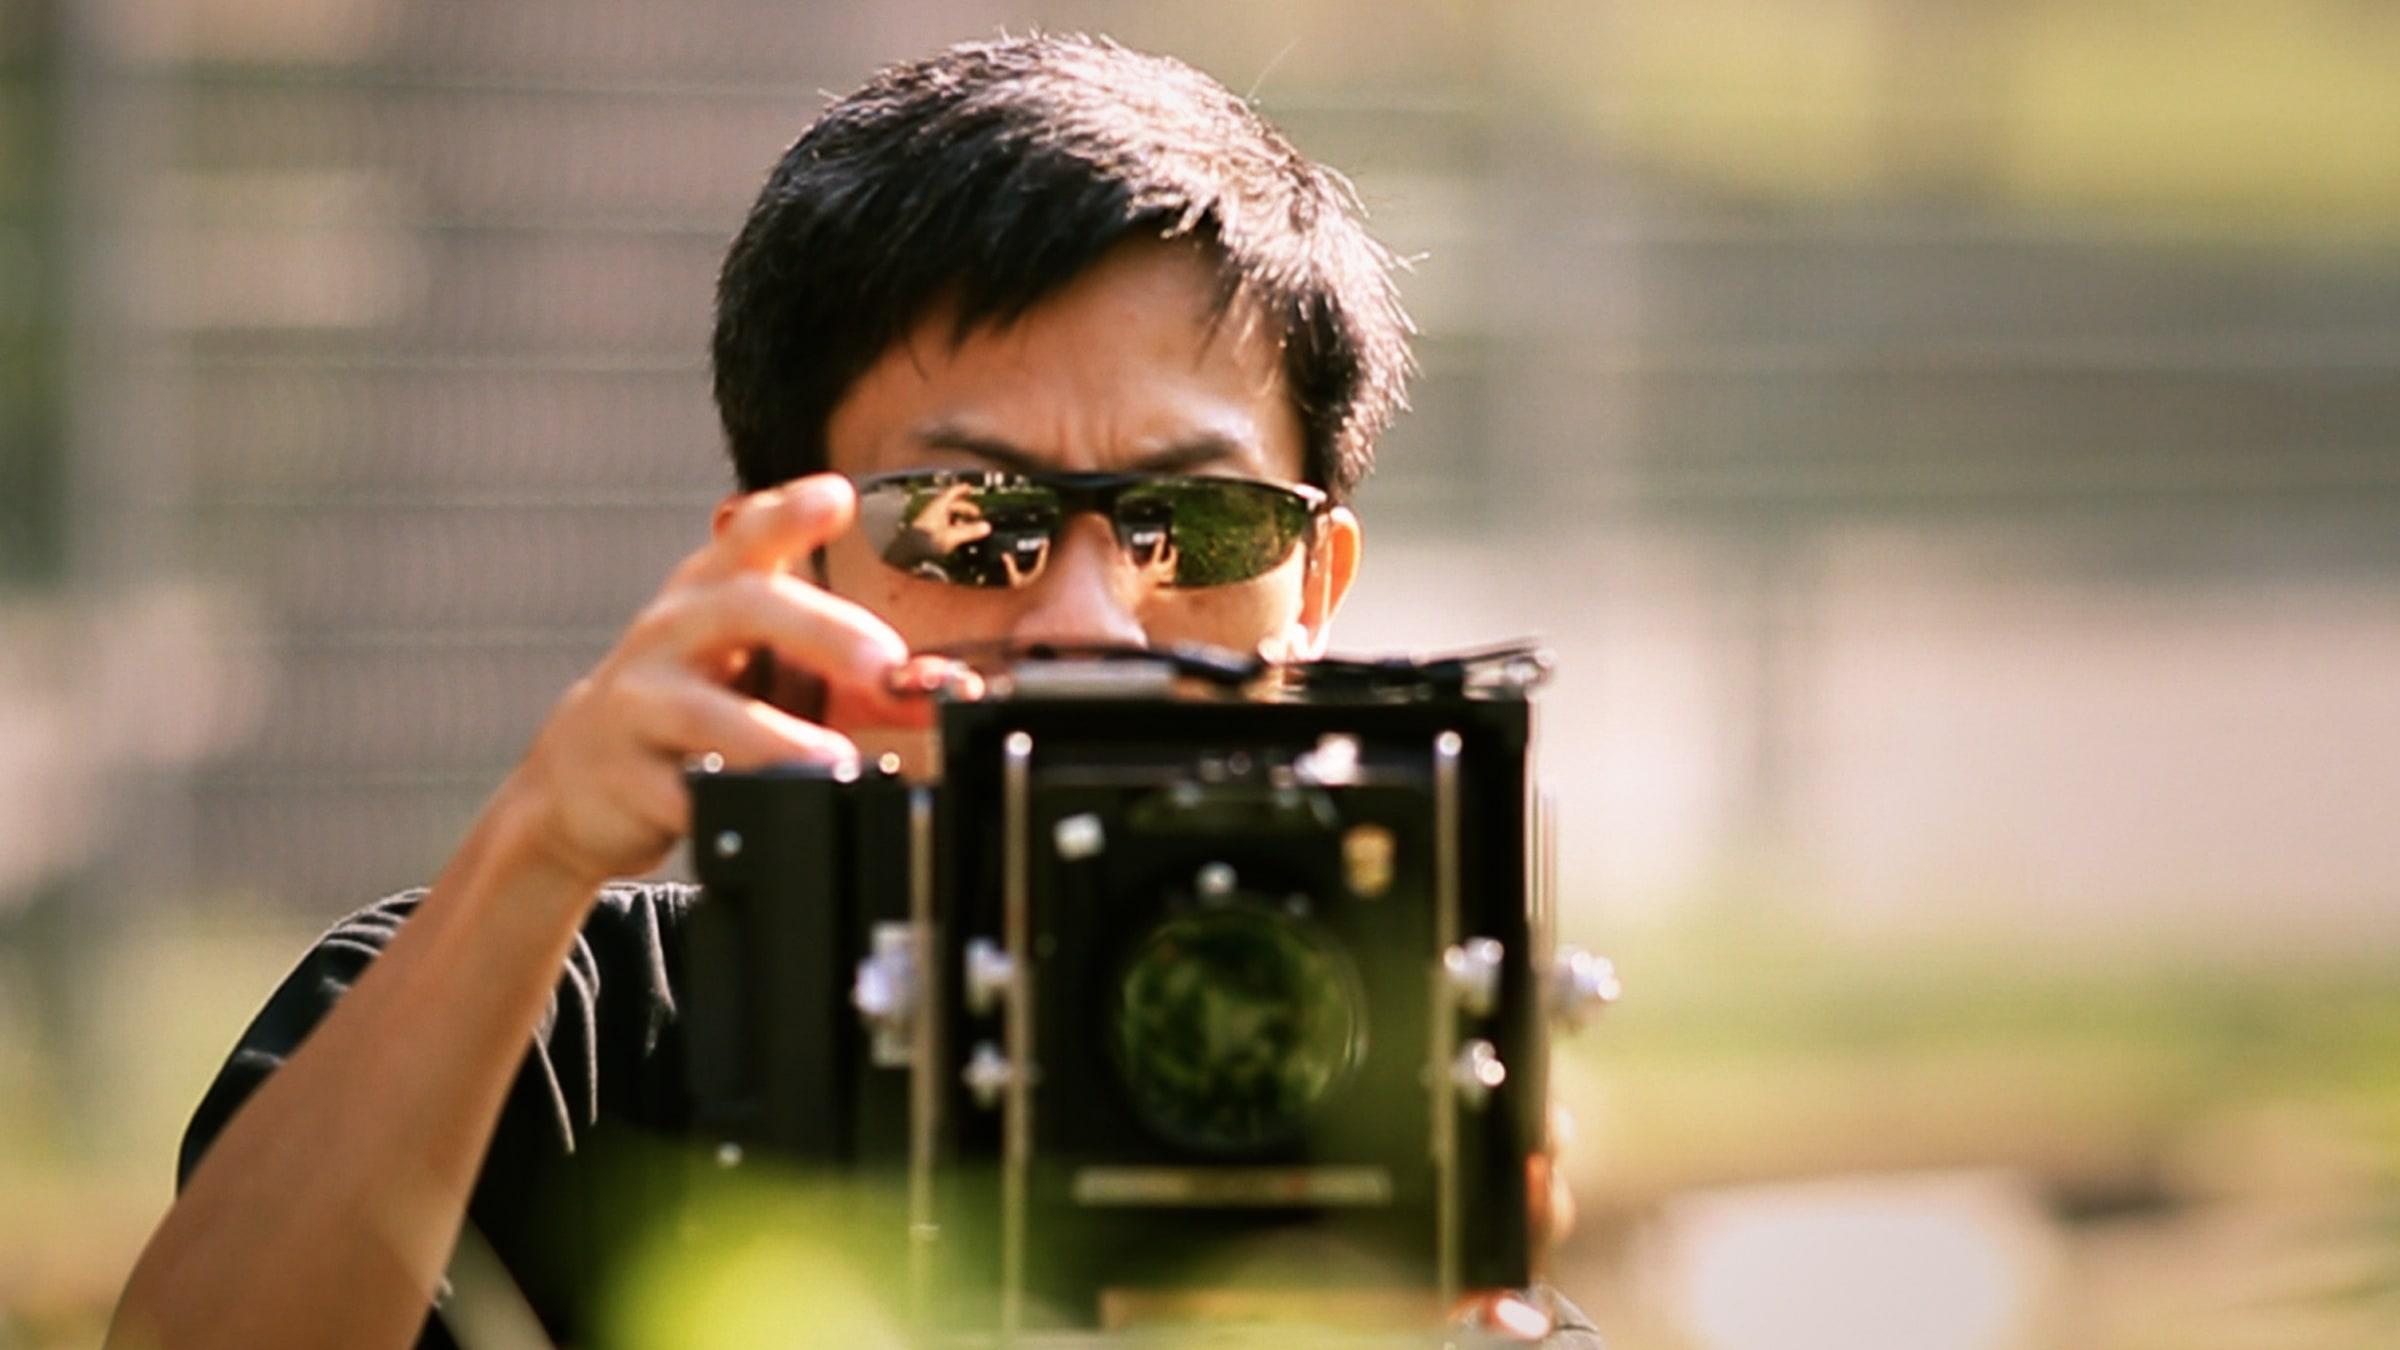 Image Makers: Singapore Photographers